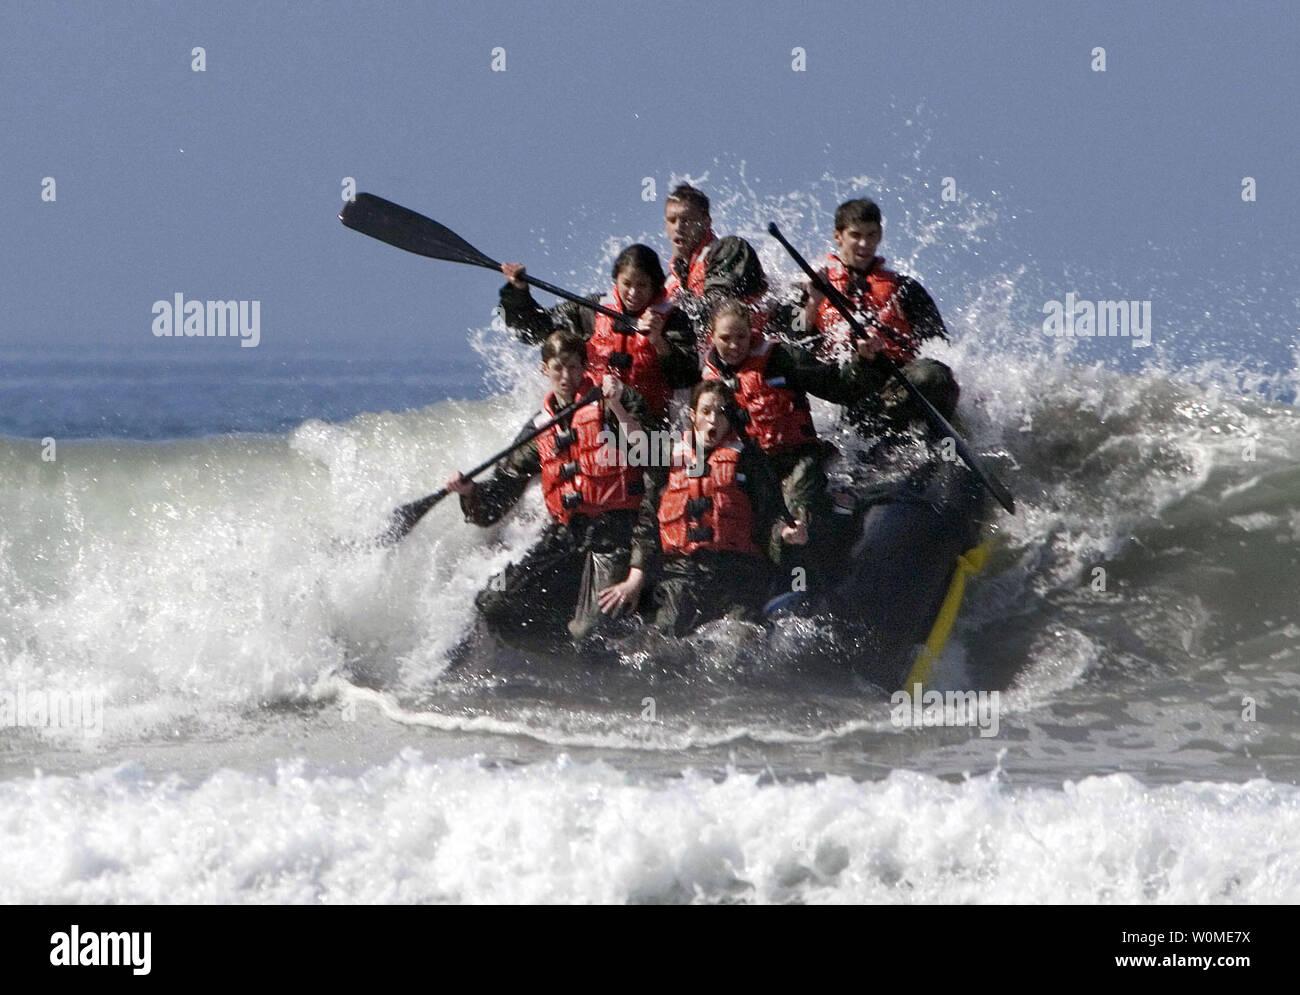 Navy Seal Training Stock Photos & Navy Seal Training Stock